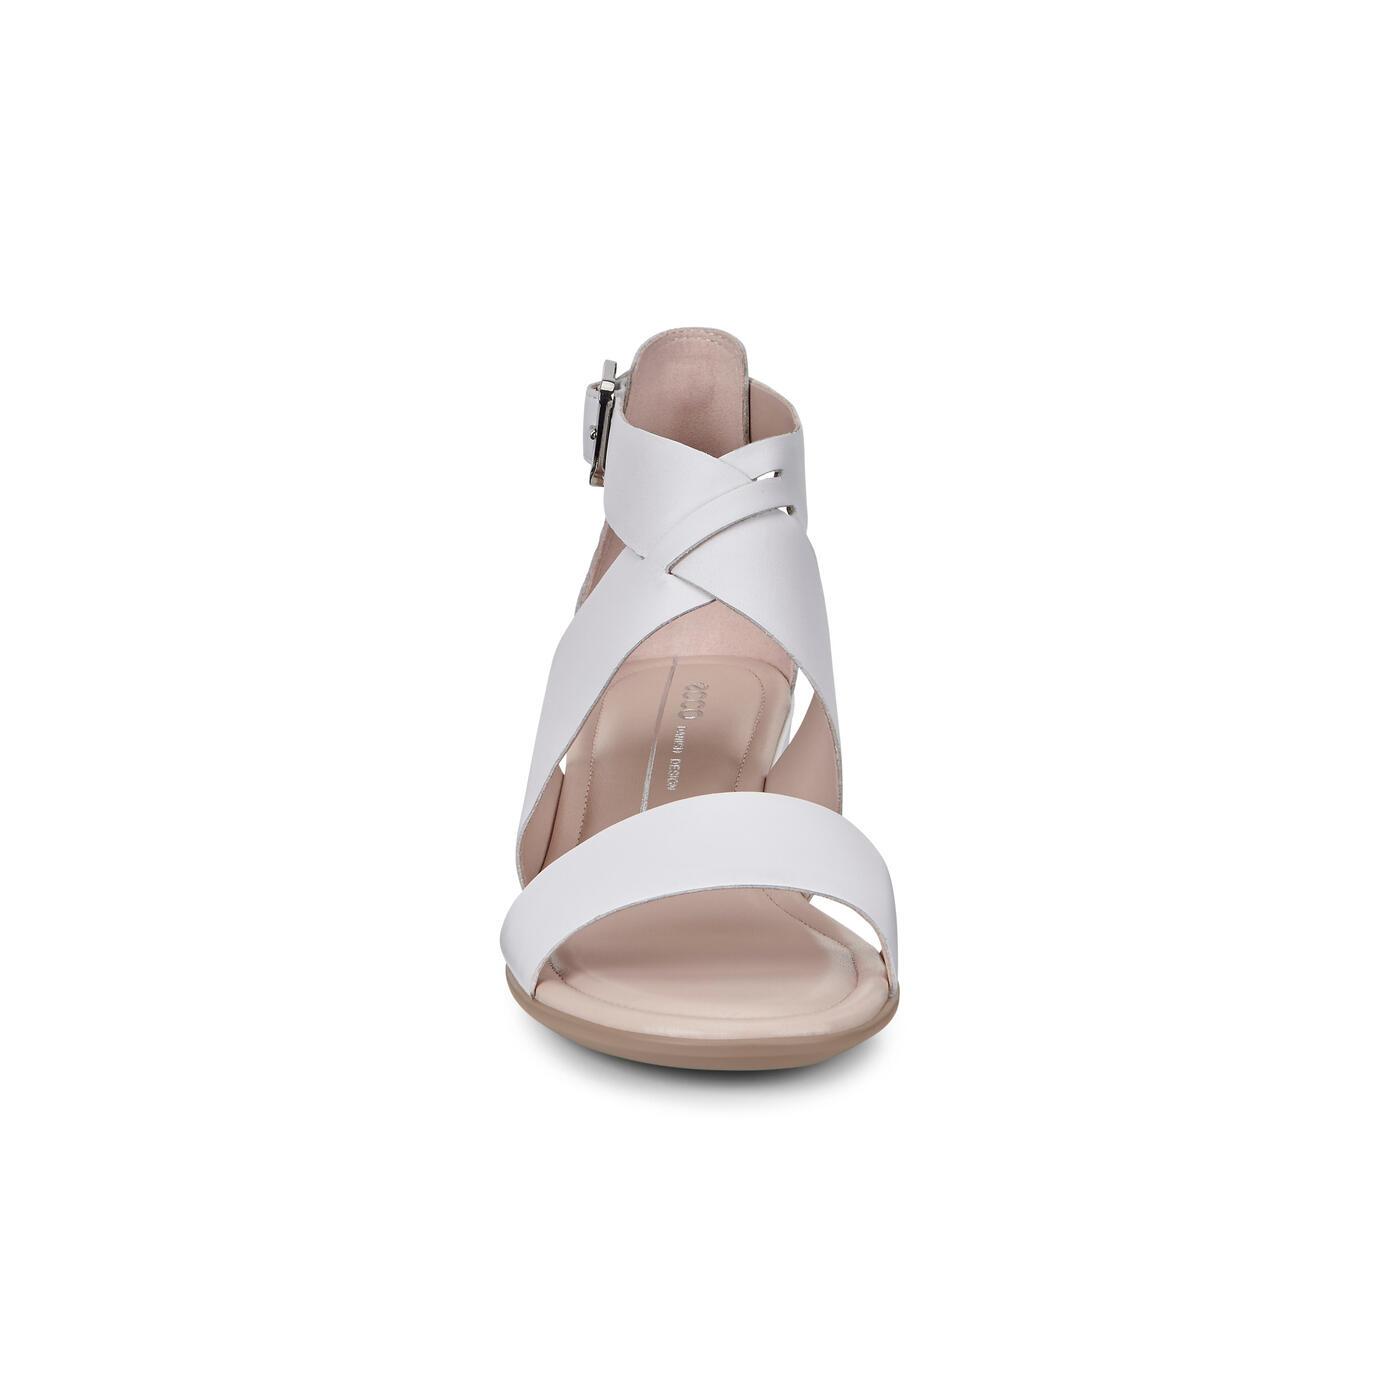 ECCO SHAPE WEDGE SANDAL Ankle Strap 35mm